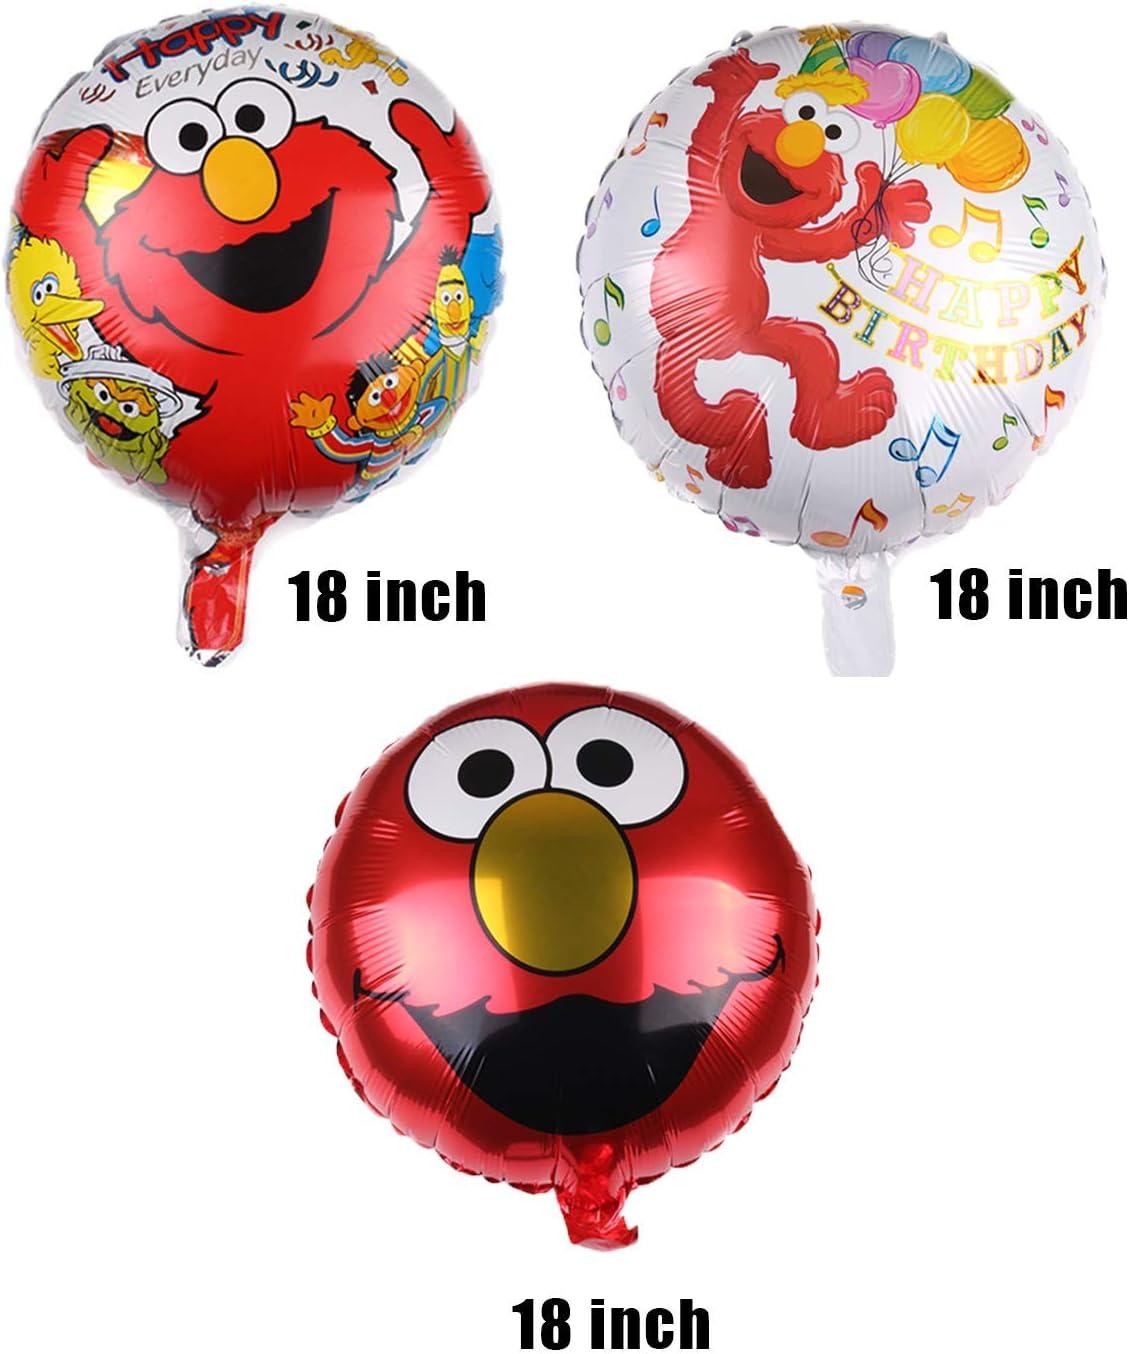 6 Pcs ELMO Foil Balloons for Kids Gift Birthday Party Supplies Decor